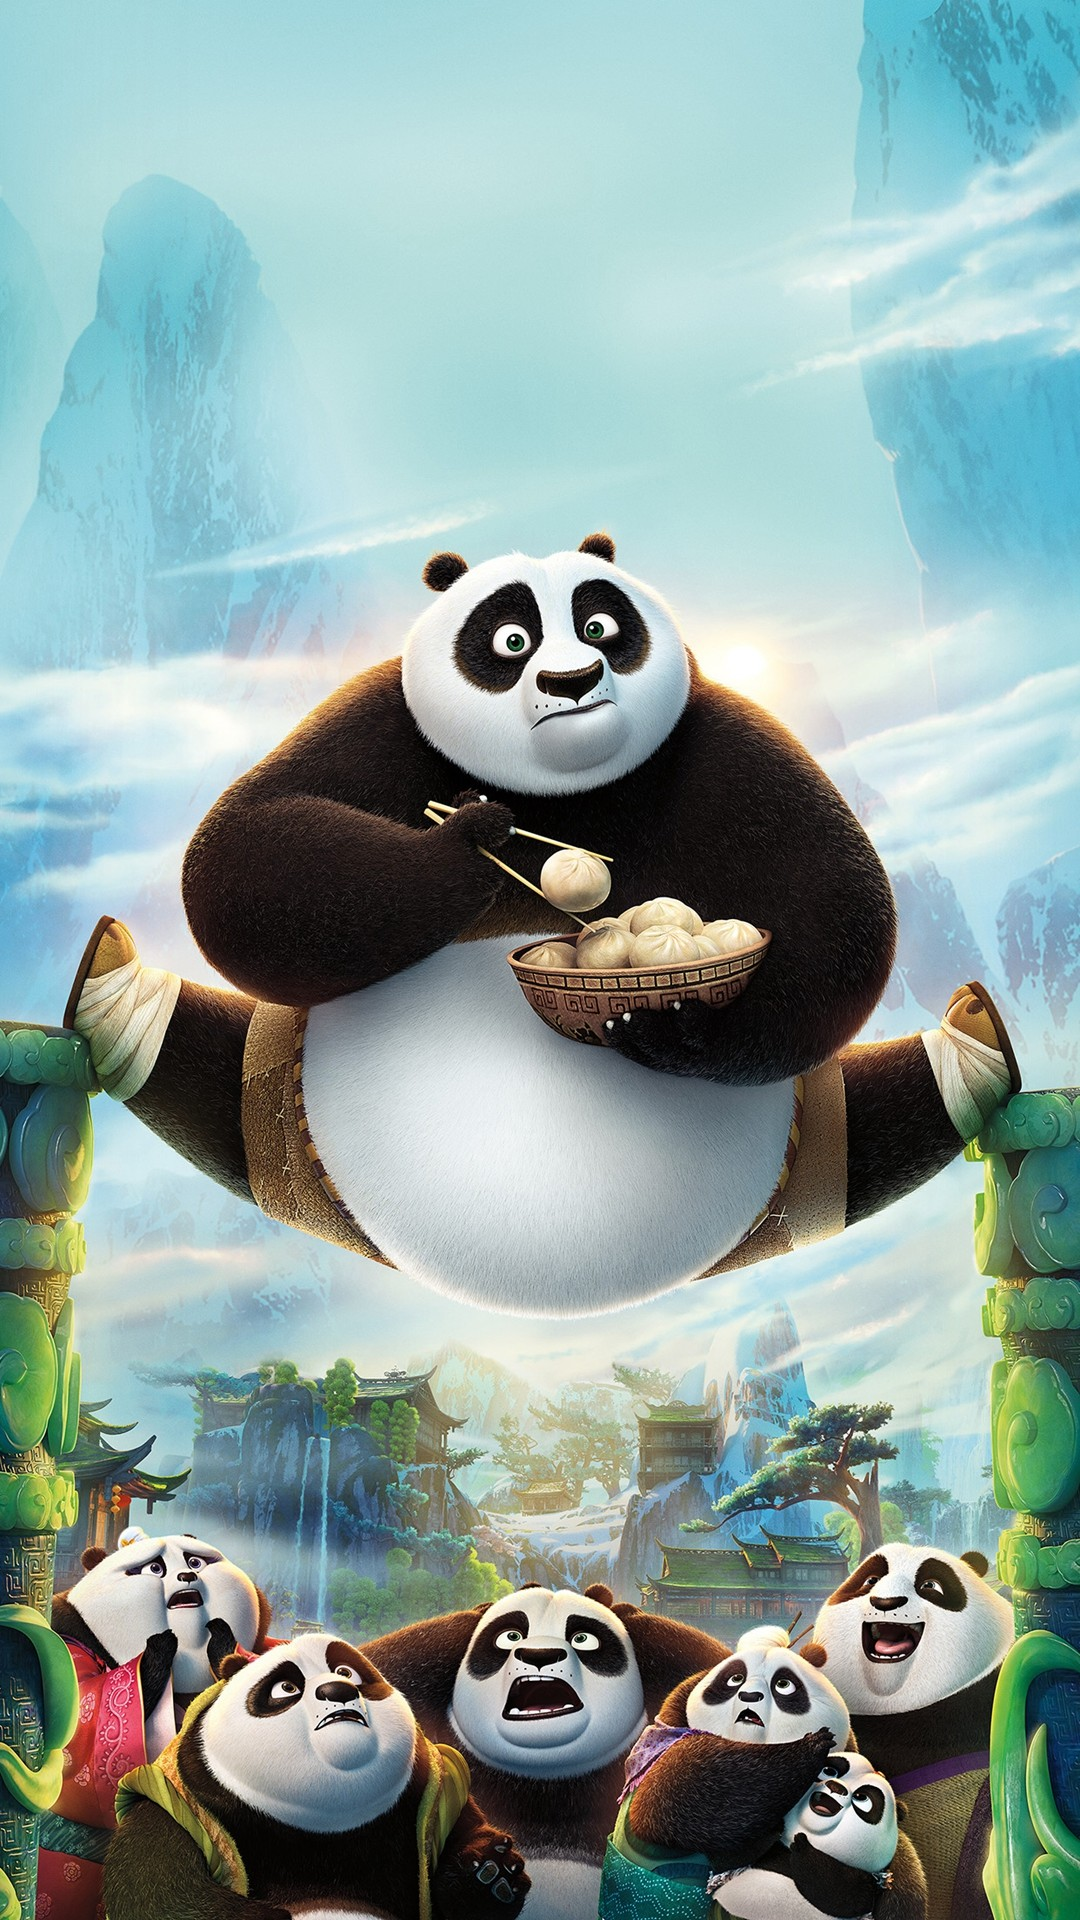 Cartoon Panda Wallpaper 71 Images